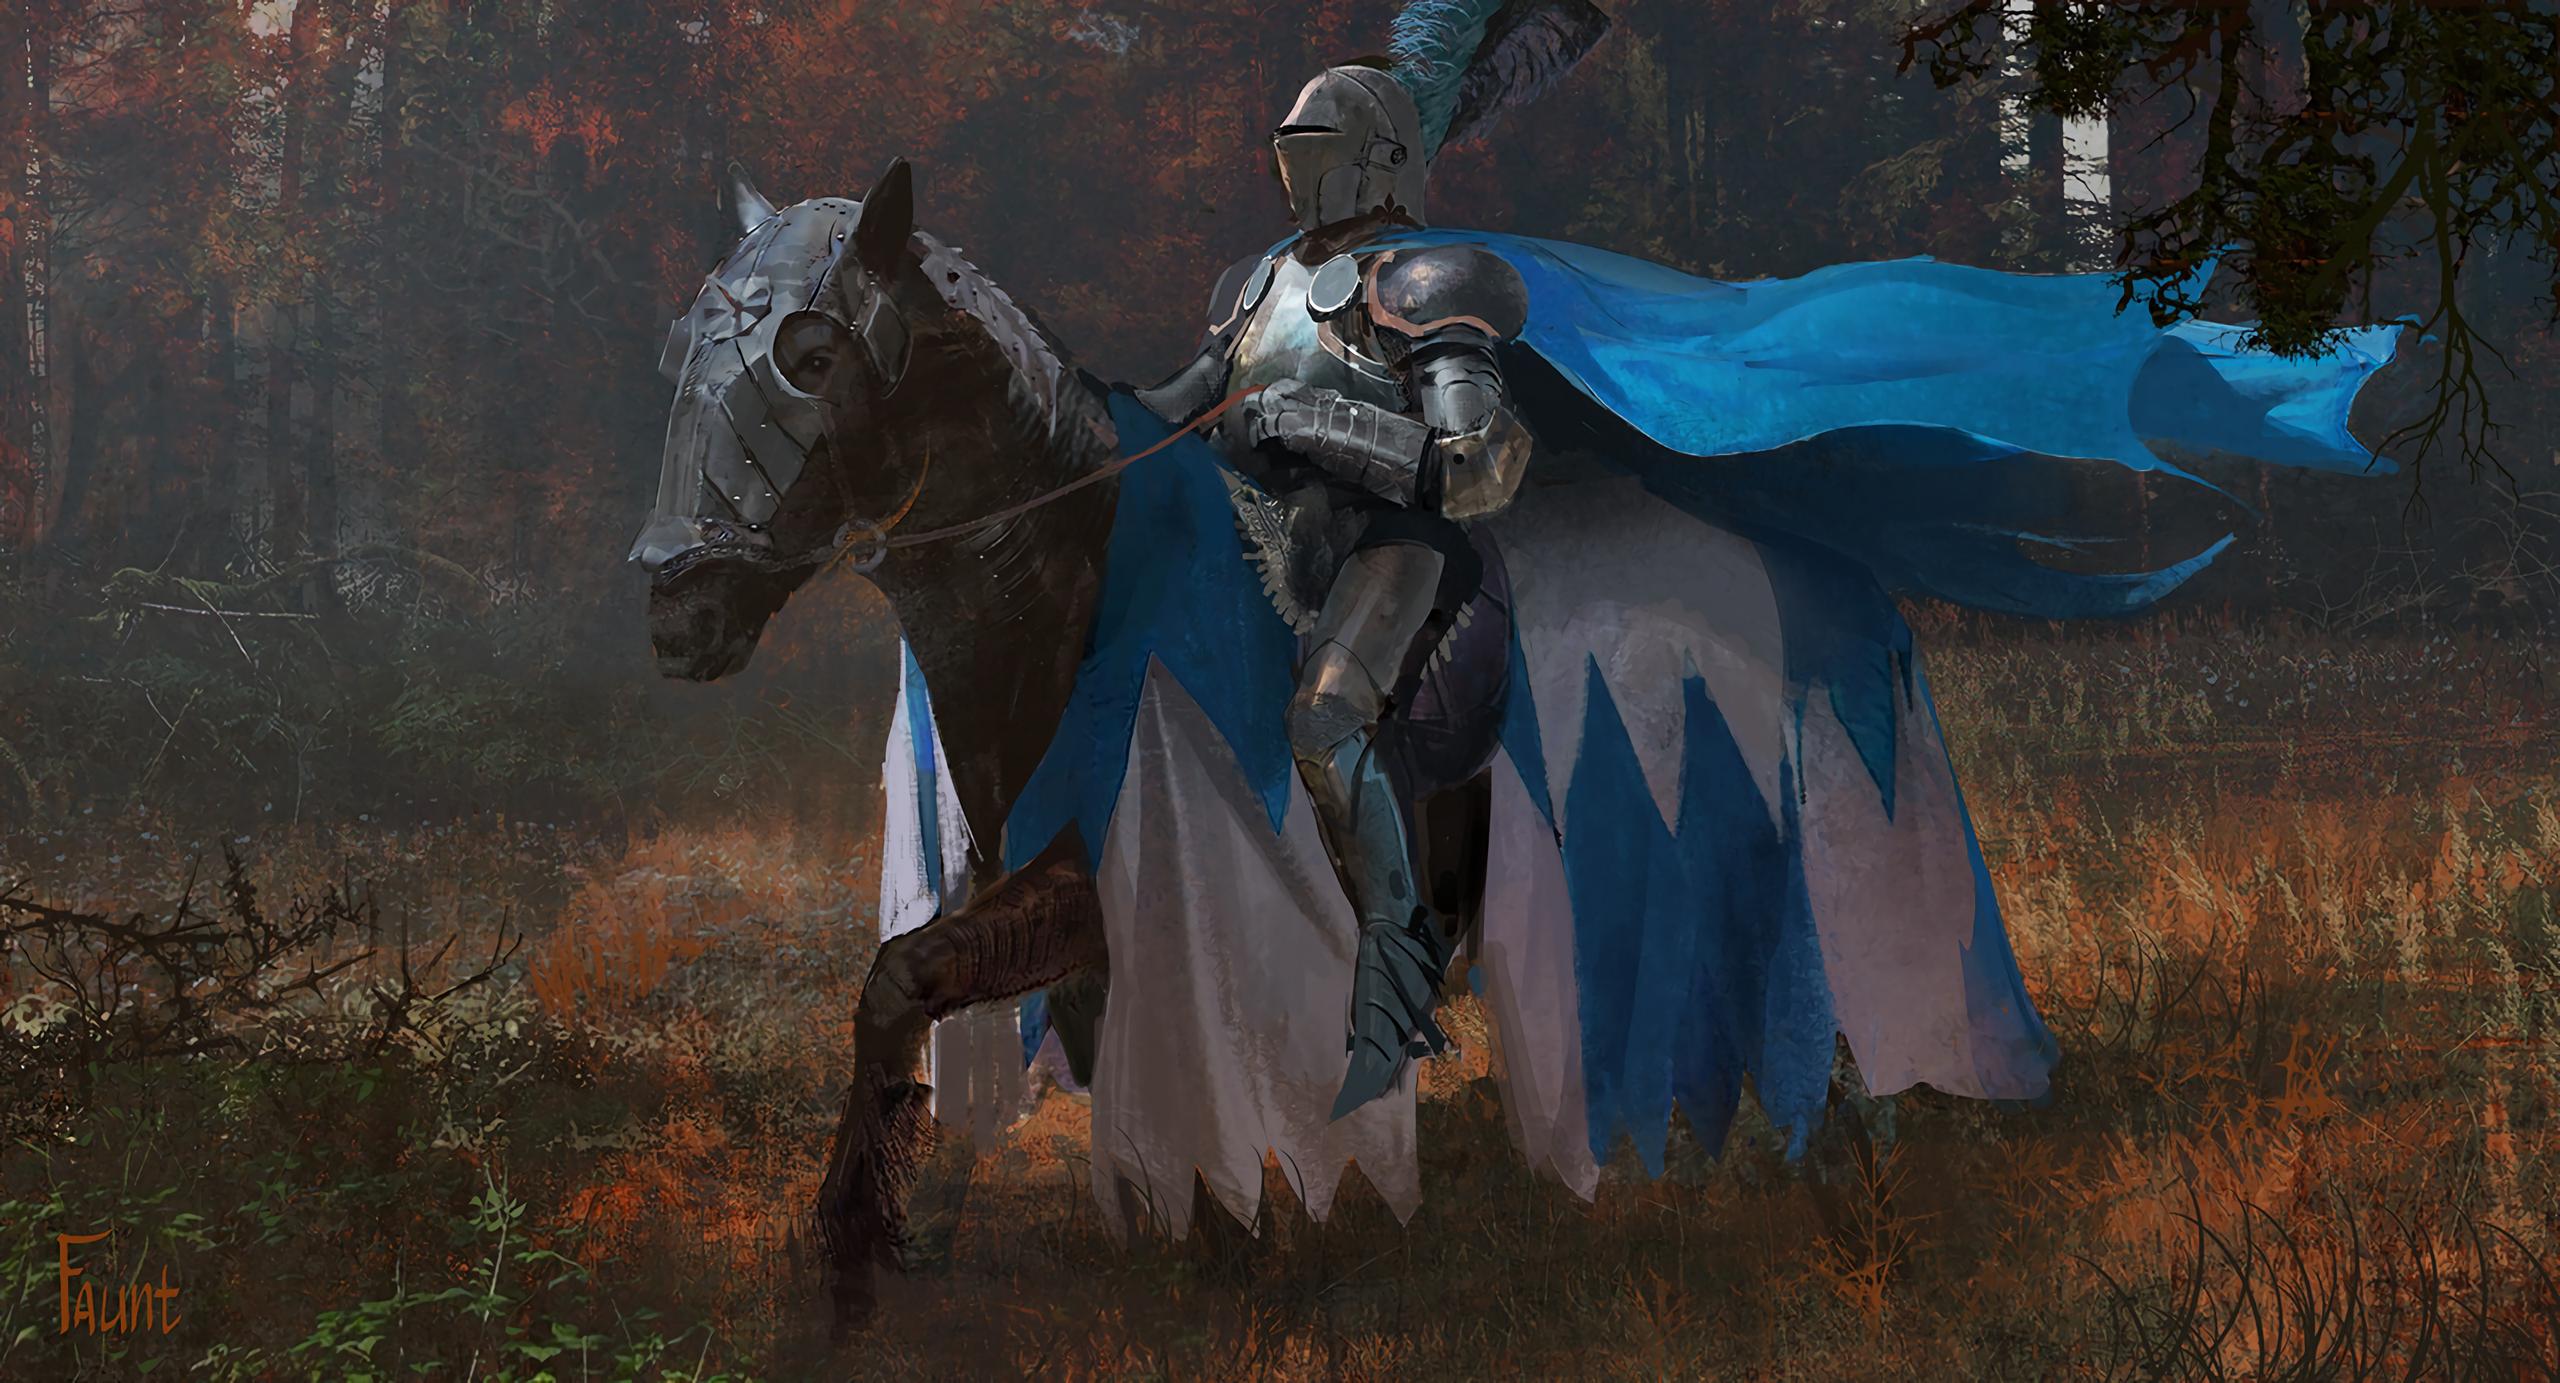 Armor Horse Knight Warrior 2560x1383